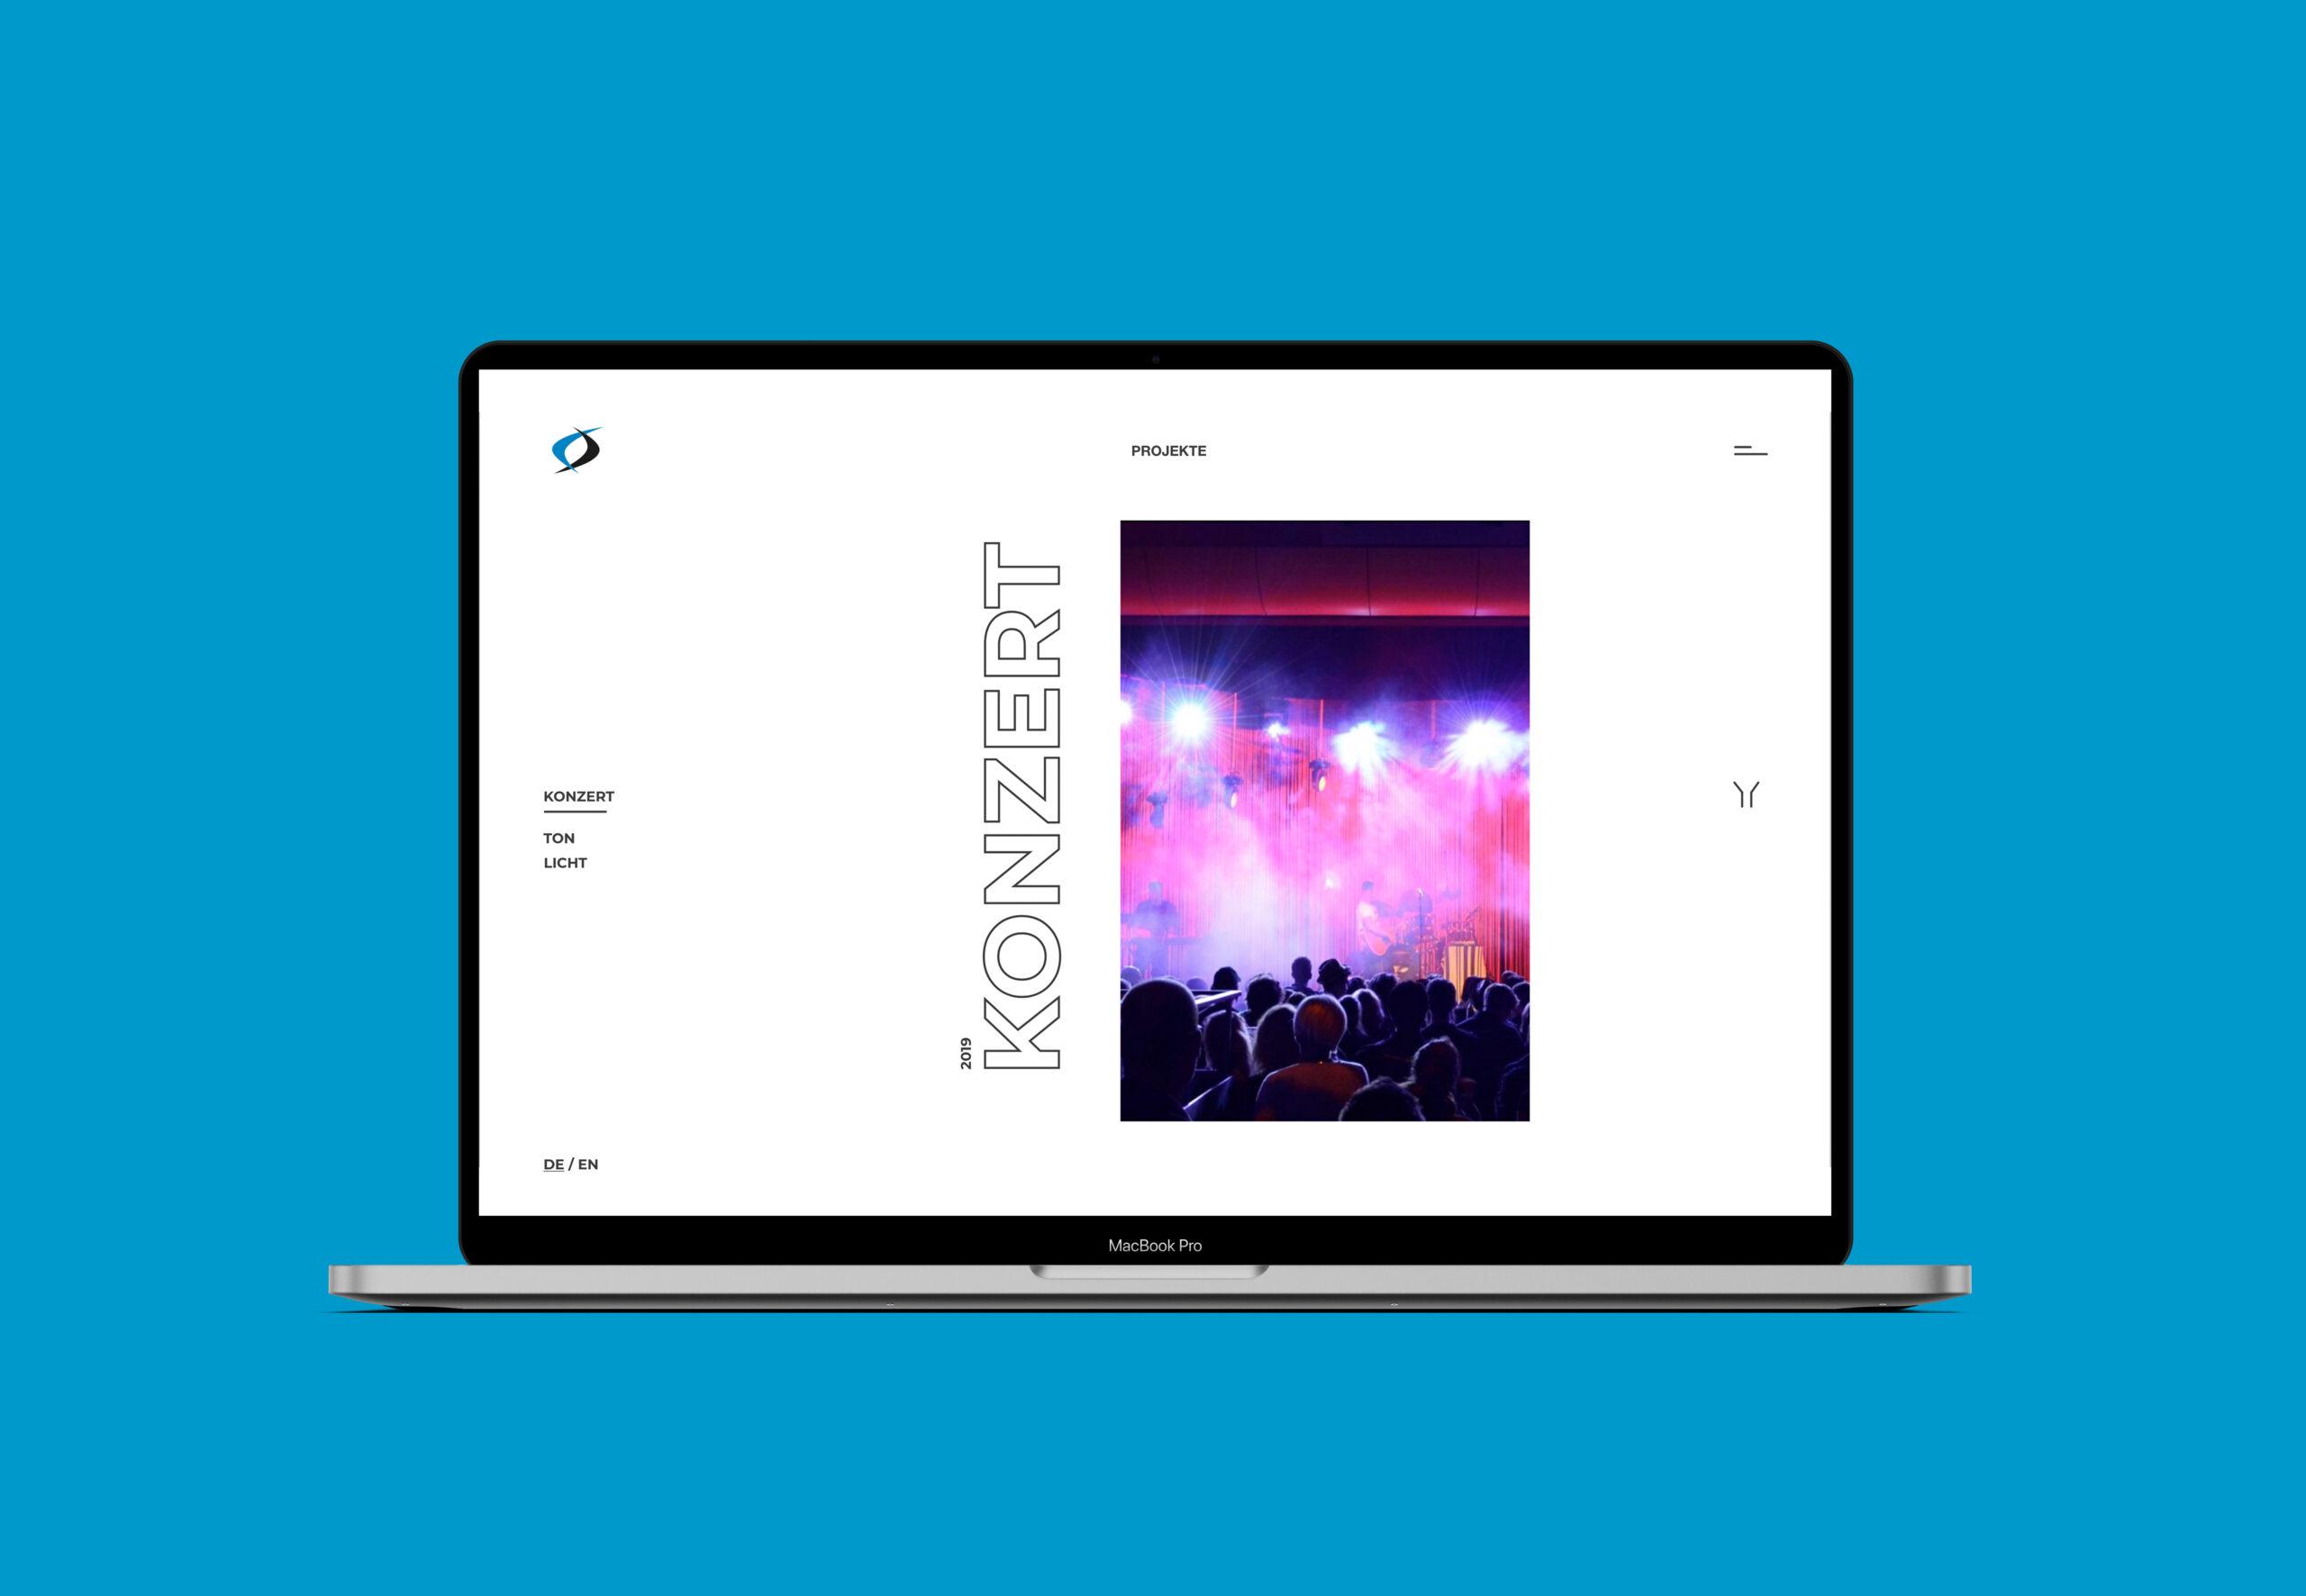 MacBook-Hell